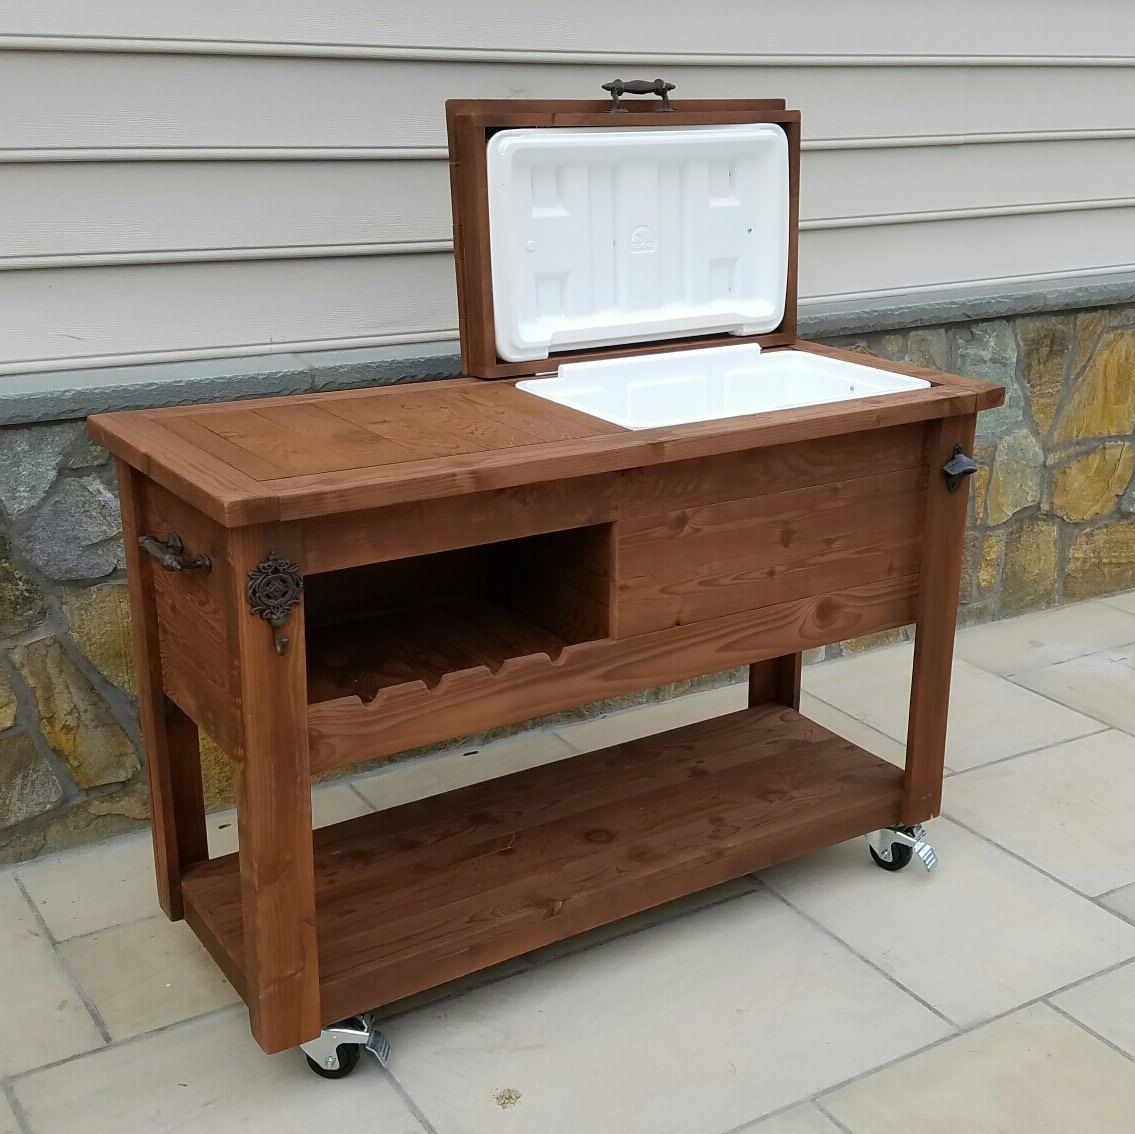 Outdoor Bar Cart With Cooler